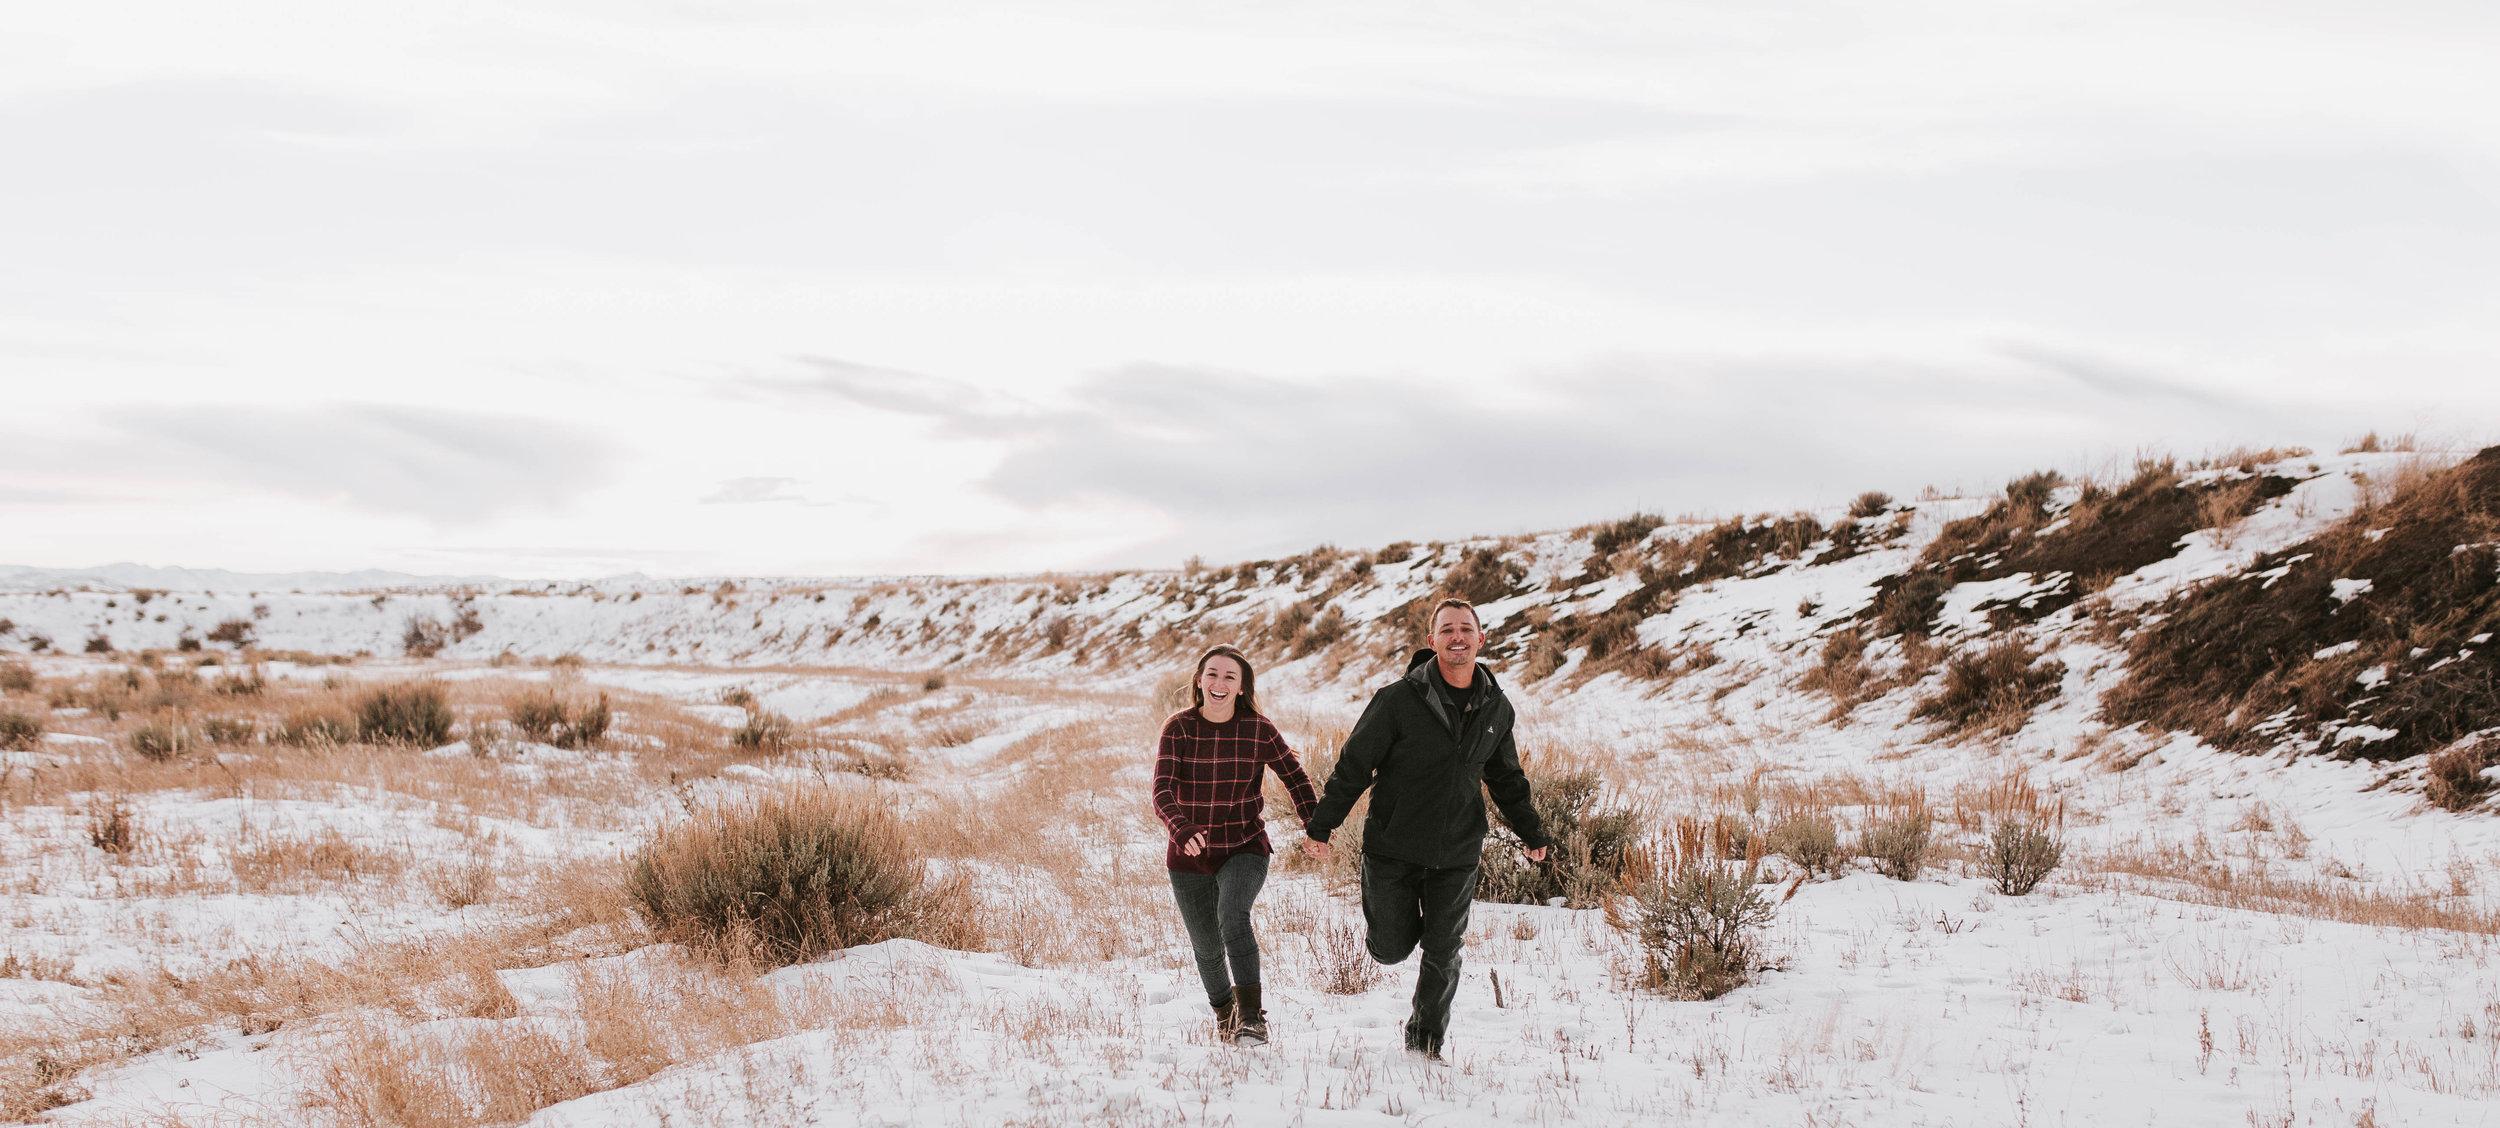 nicole-daacke-photography-grand-teton-elopement-grand-teton-wedding-national-park-wedding-adventure-wedding-adventurous-engagement-session-snowy-winter-inspiration-photographer-1.jpg